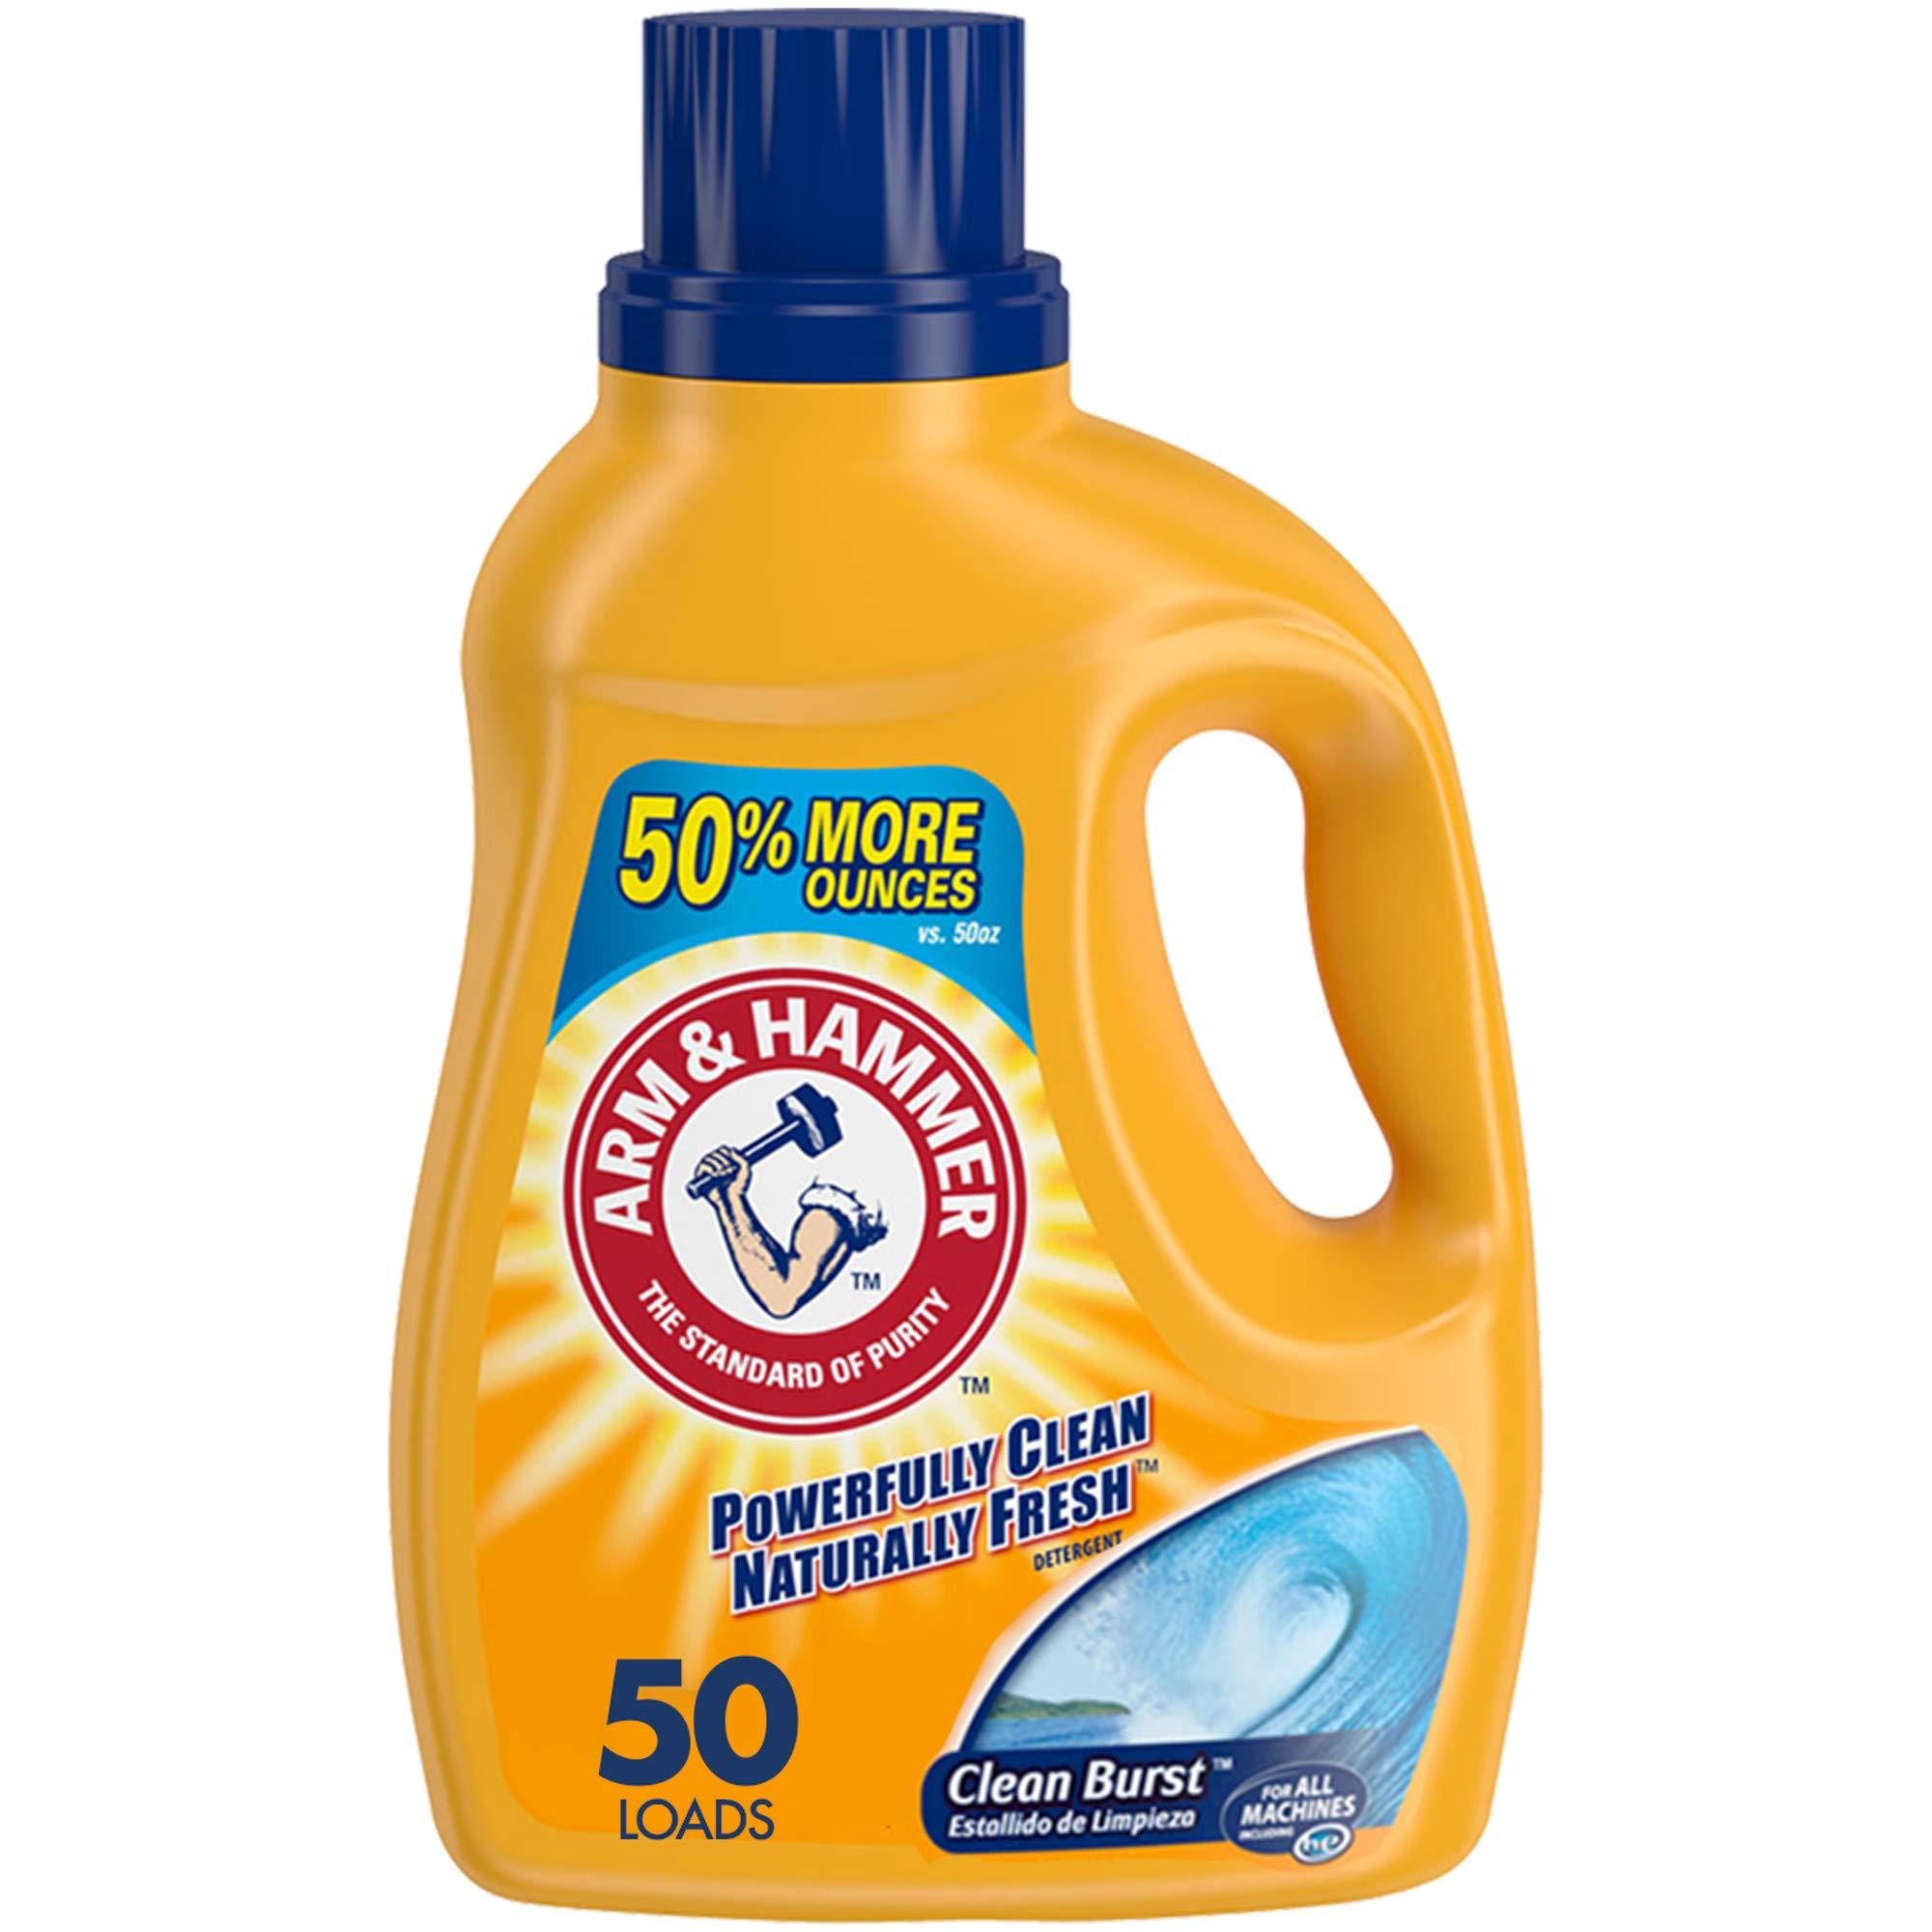 Arm & Hammer Clean Burst Liquid Laundry Detergent, 50 Loads